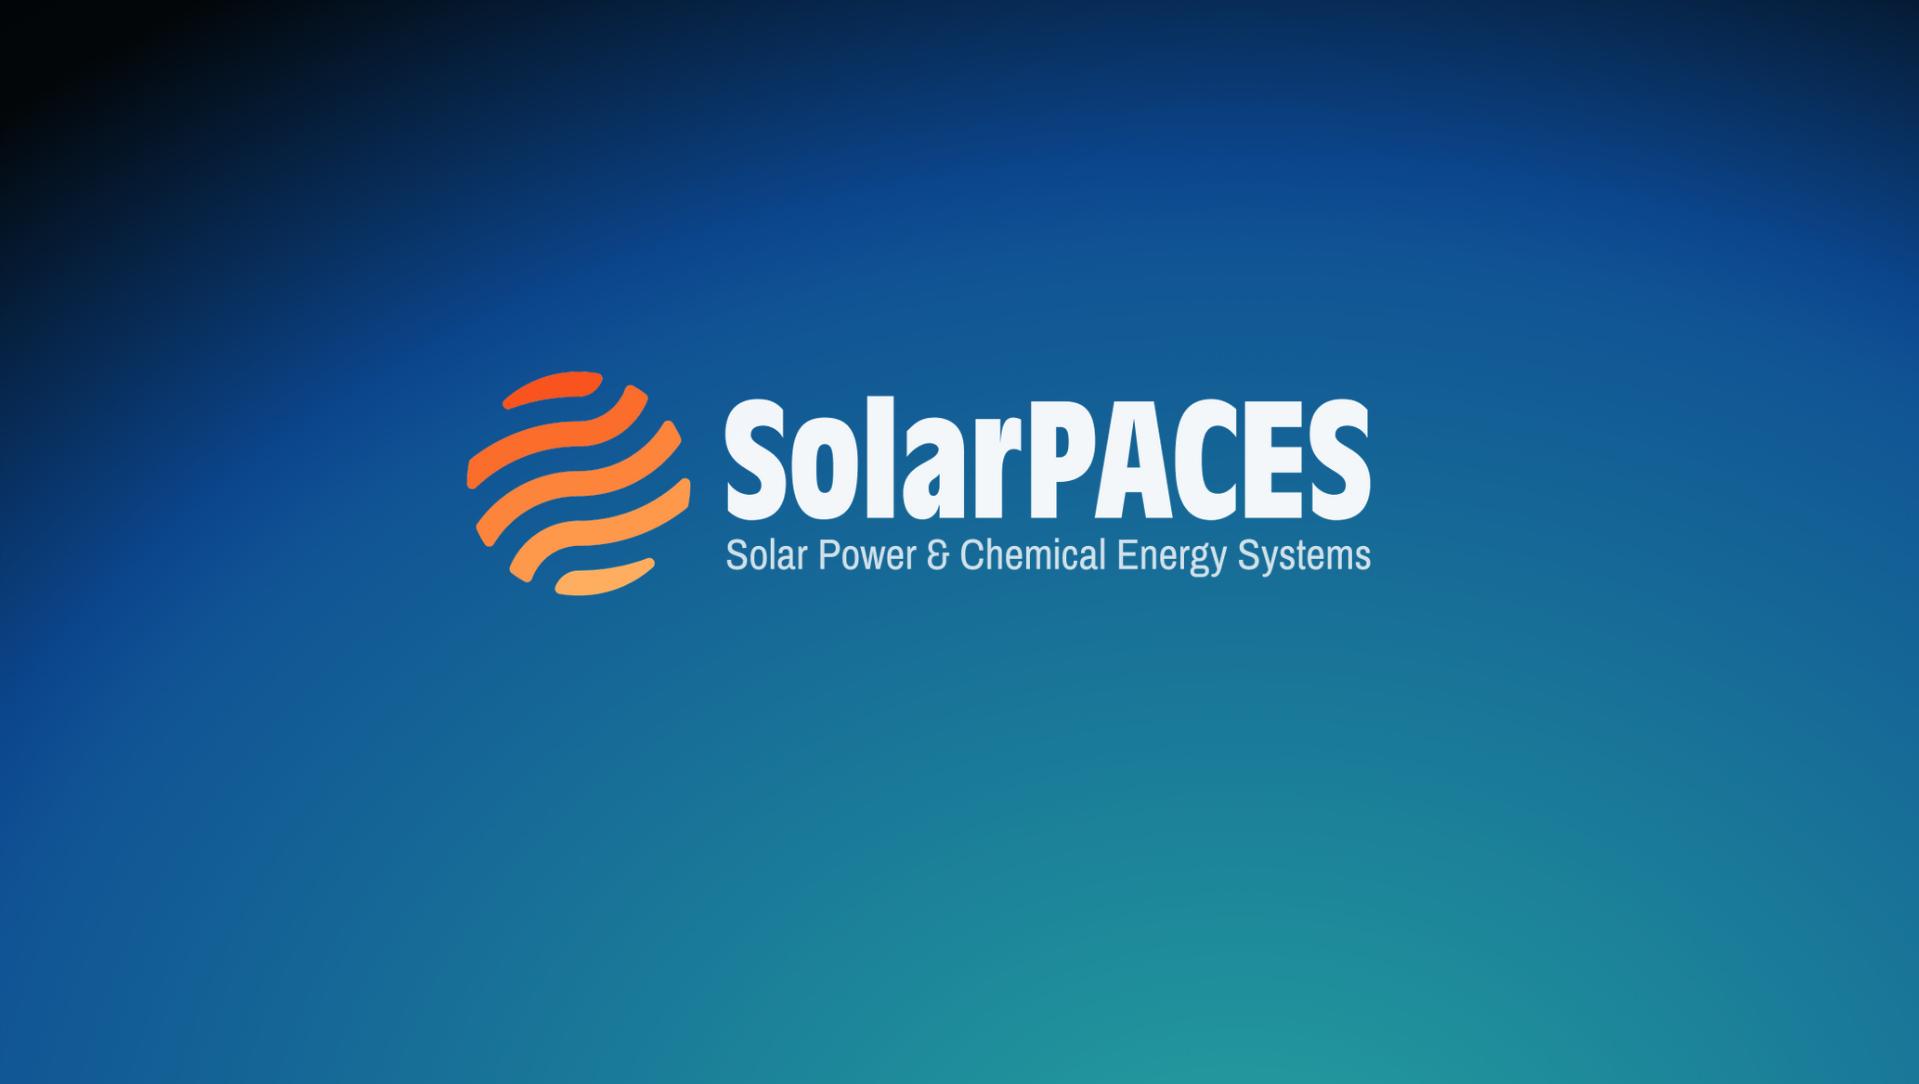 SolarPACES logo 2018